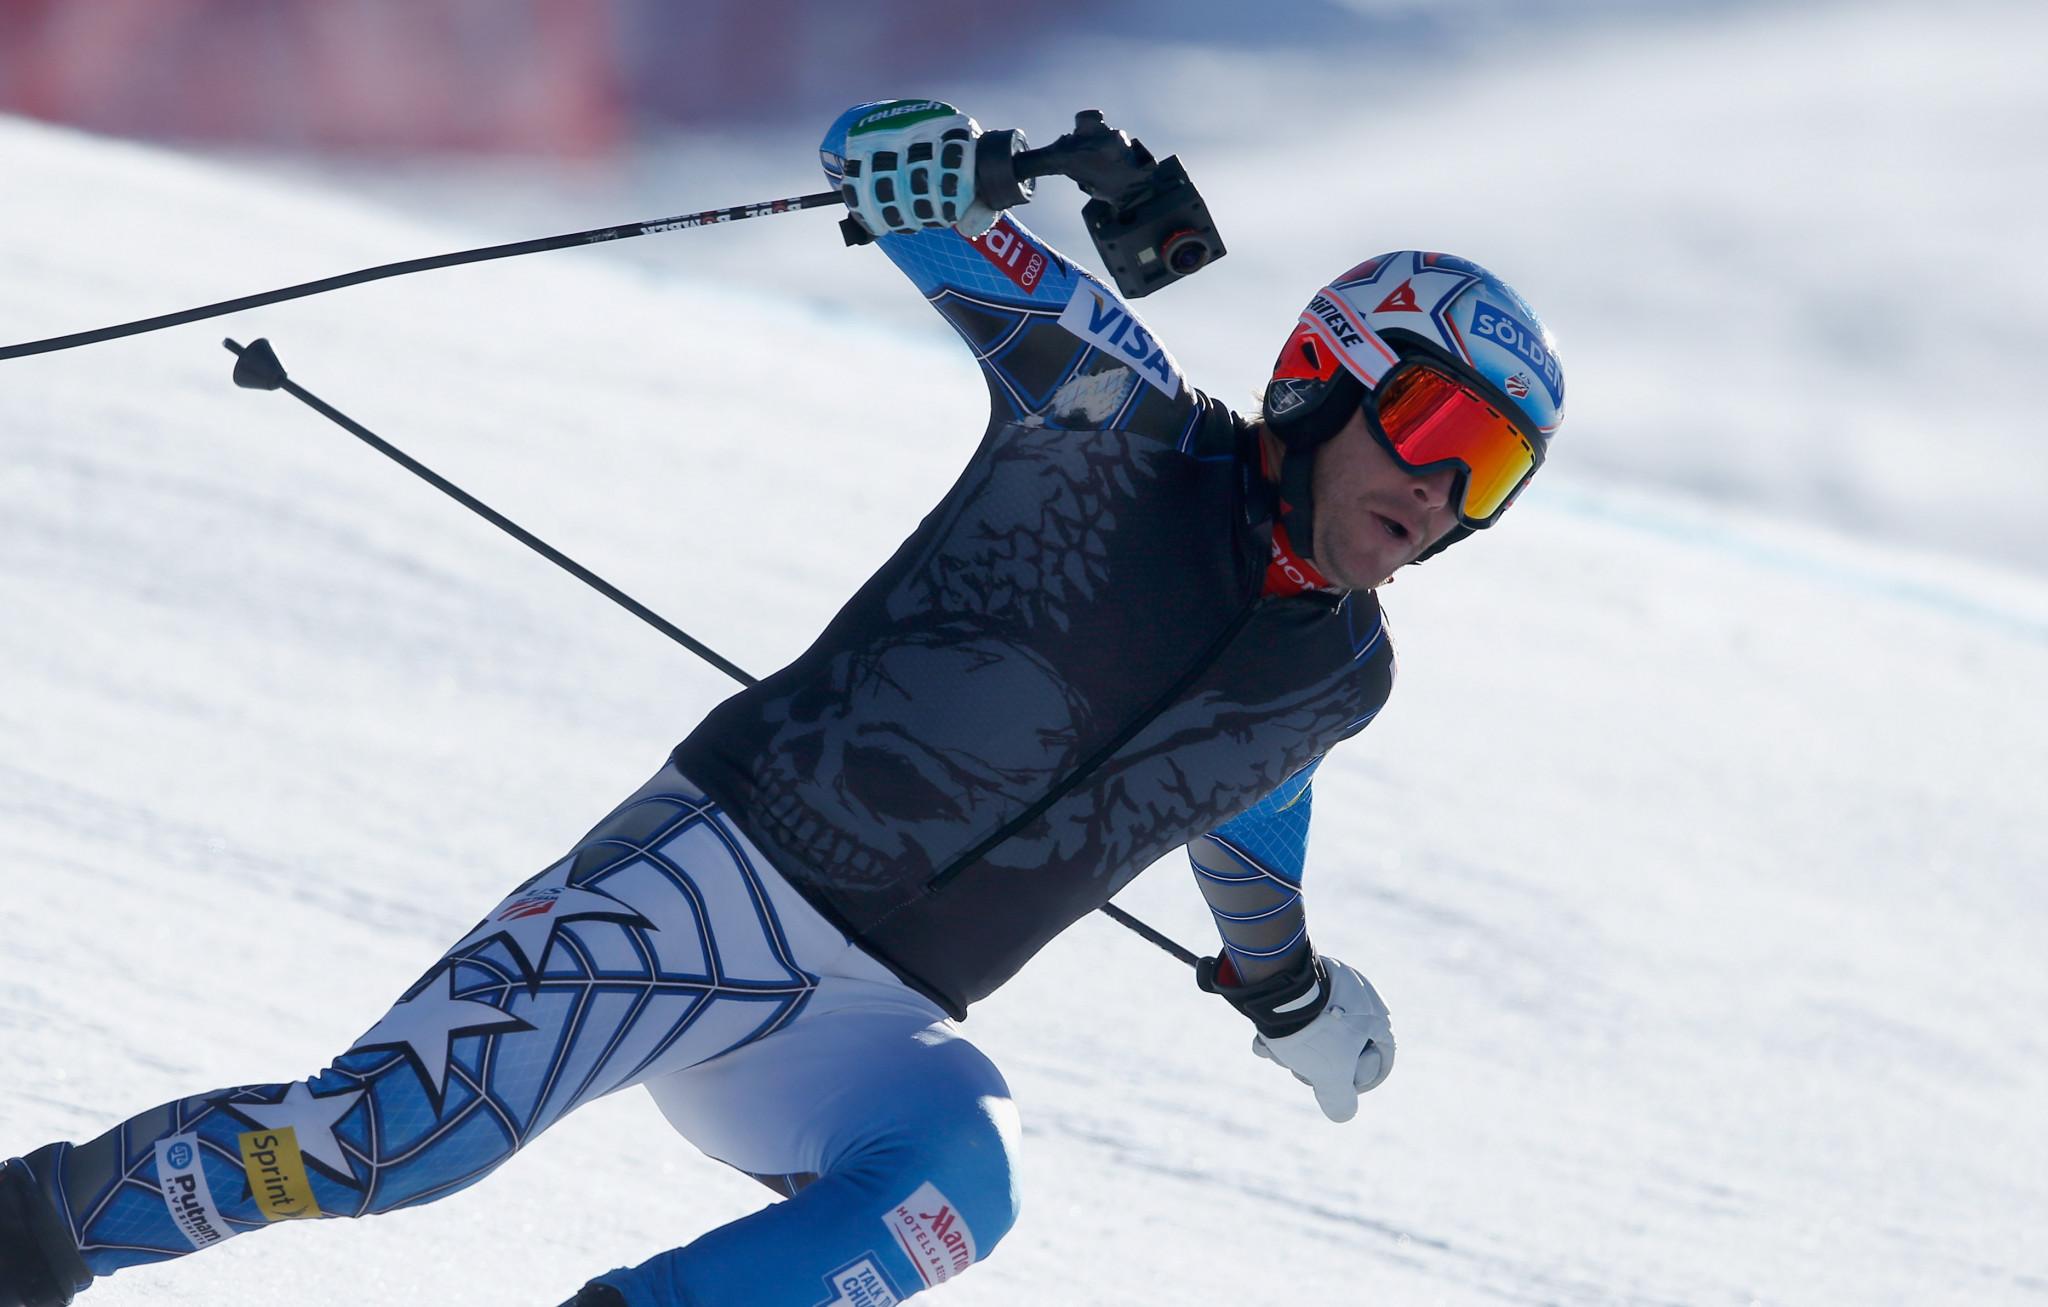 American skiing legend Miller confirms retirement